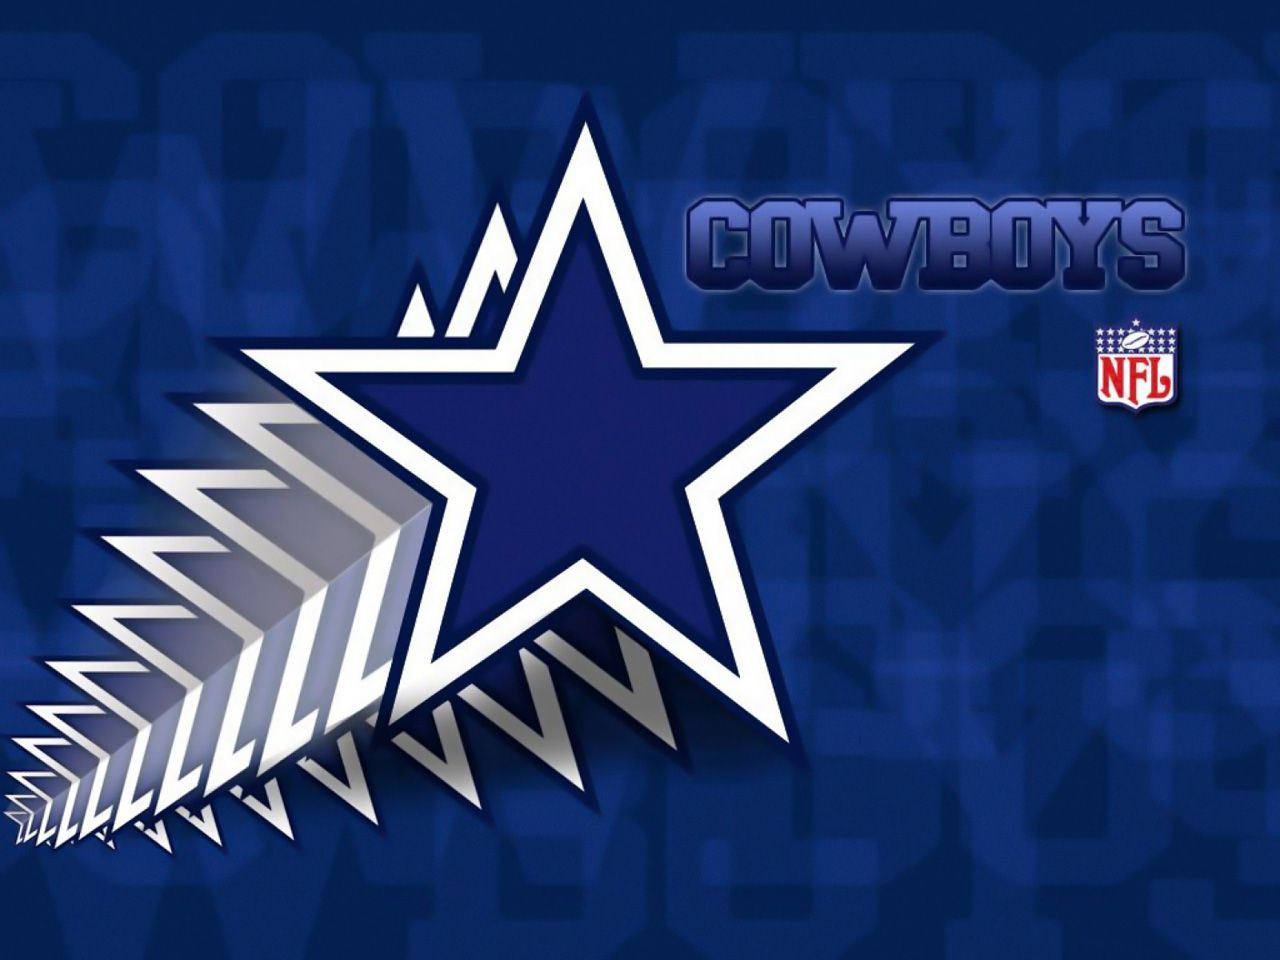 Cowboys Wallpapers   Top Cowboys Backgrounds   WallpaperAccess 1280x960